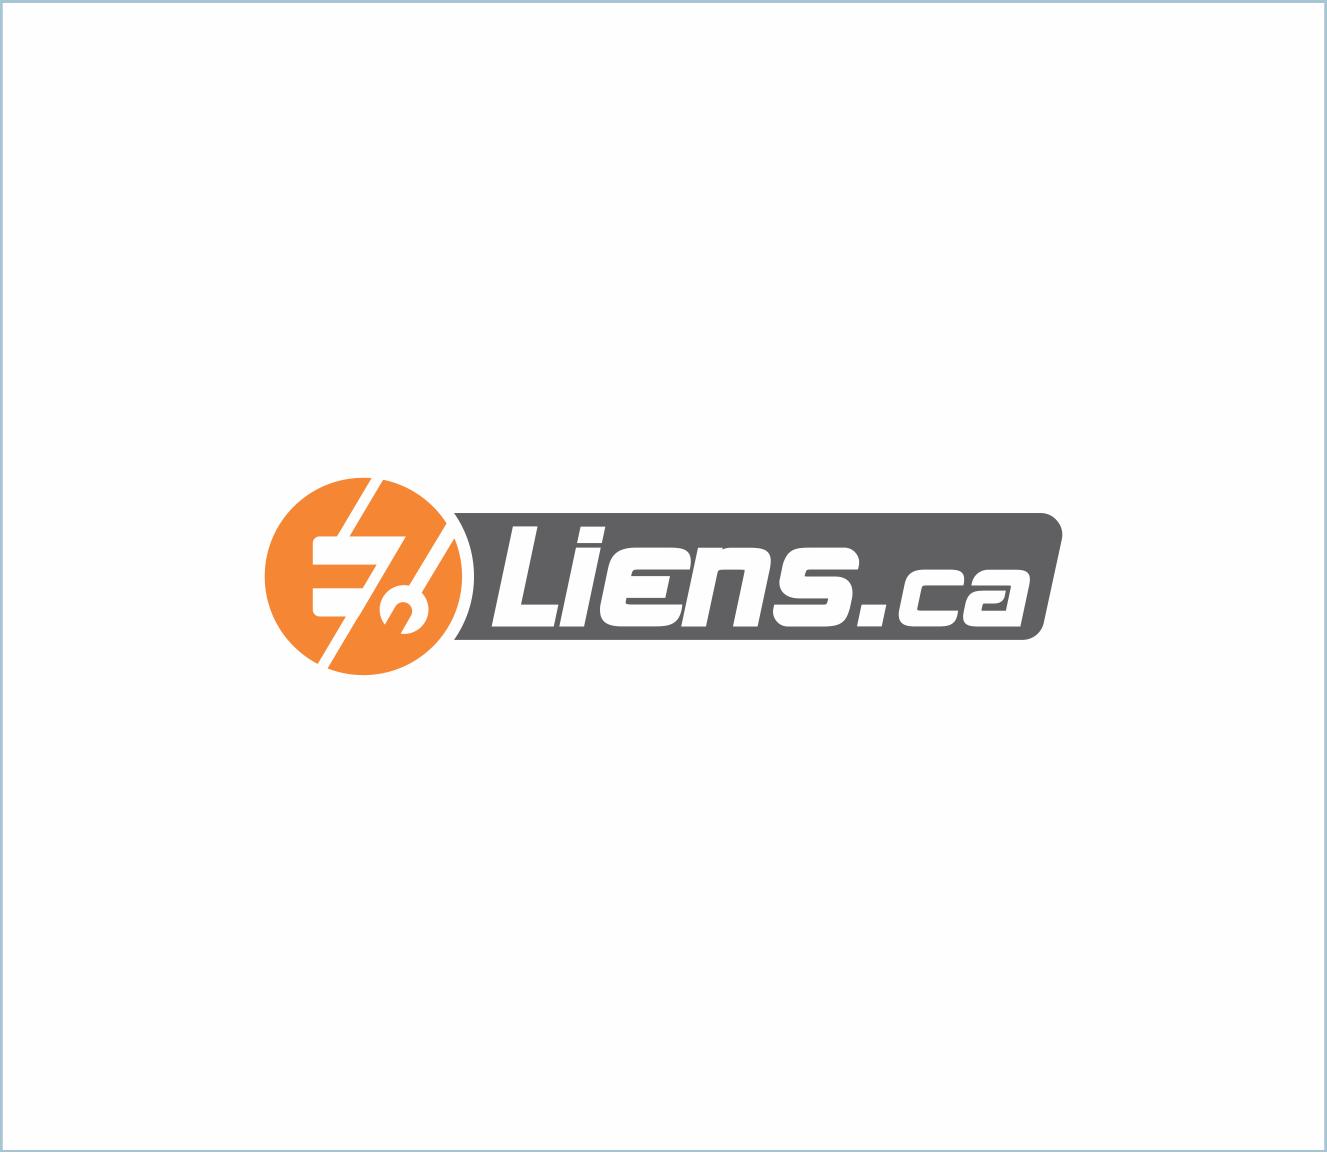 Logo Design by Armada Jamaluddin - Entry No. 71 in the Logo Design Contest Artistic Logo Design for EZliens.ca.